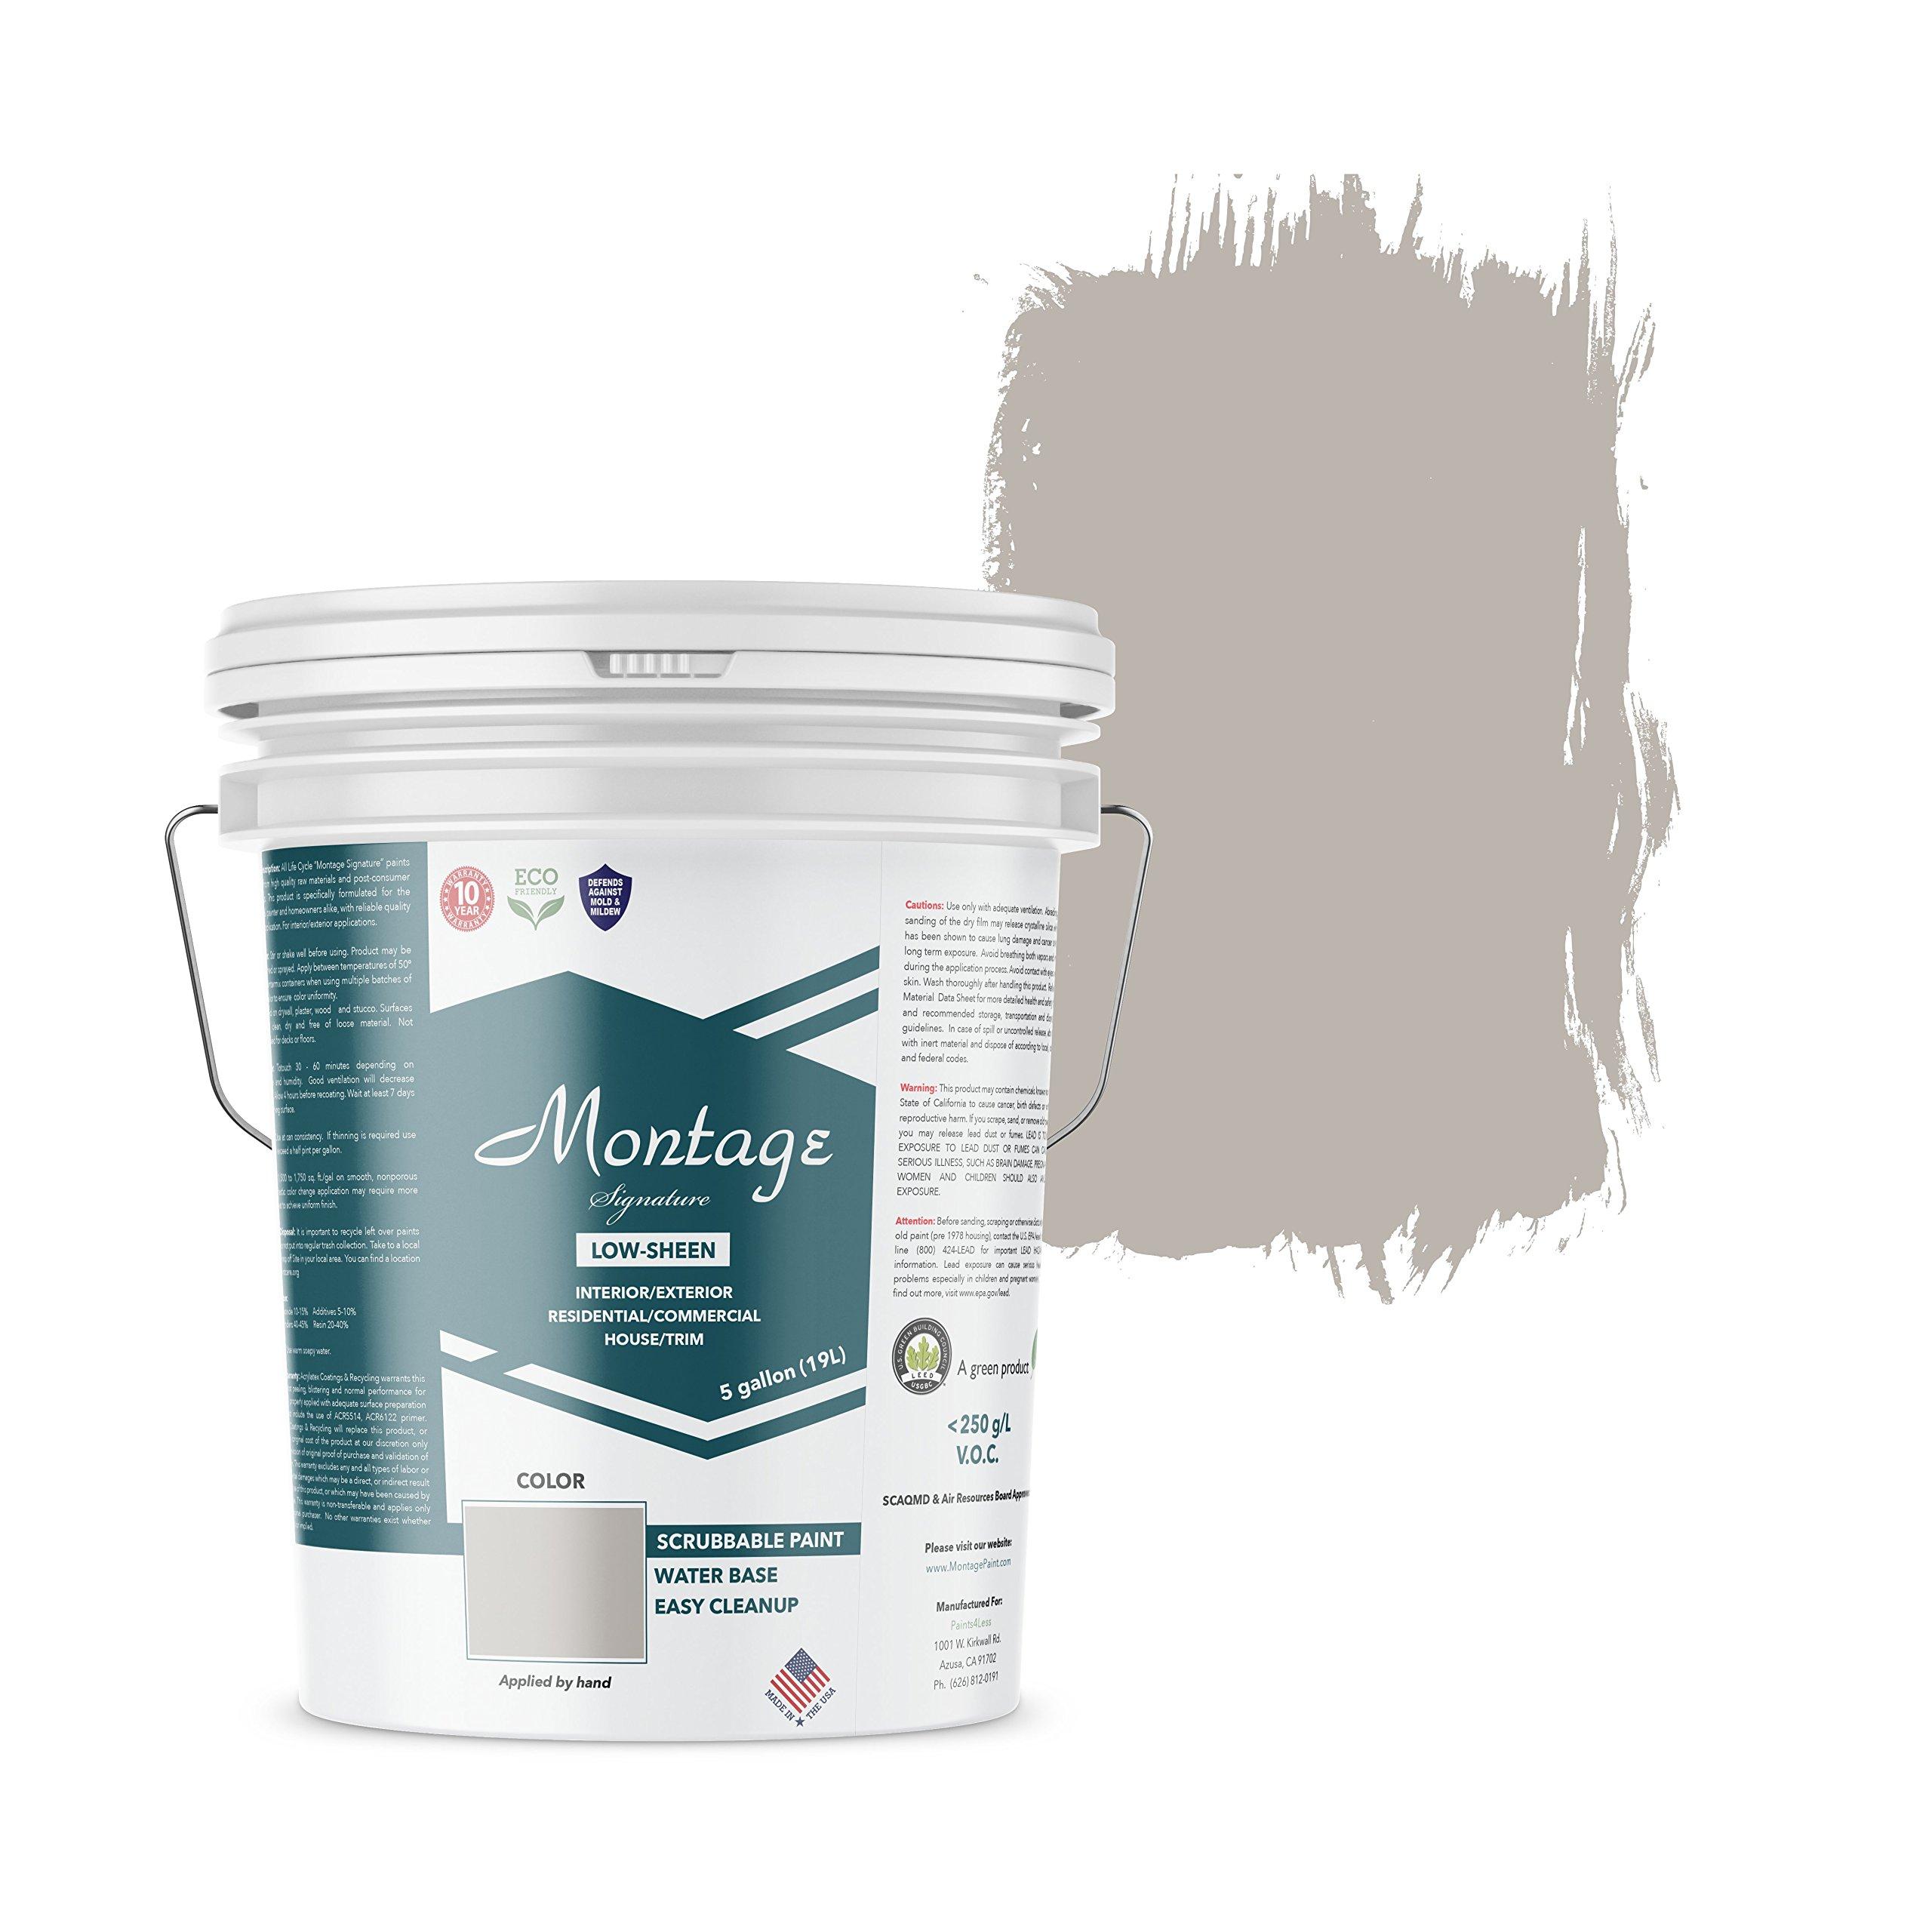 Montage Signature Interior/Exterior Eco-Friendly Paint, Dove Gray - Low Sheen, 5 Gallon